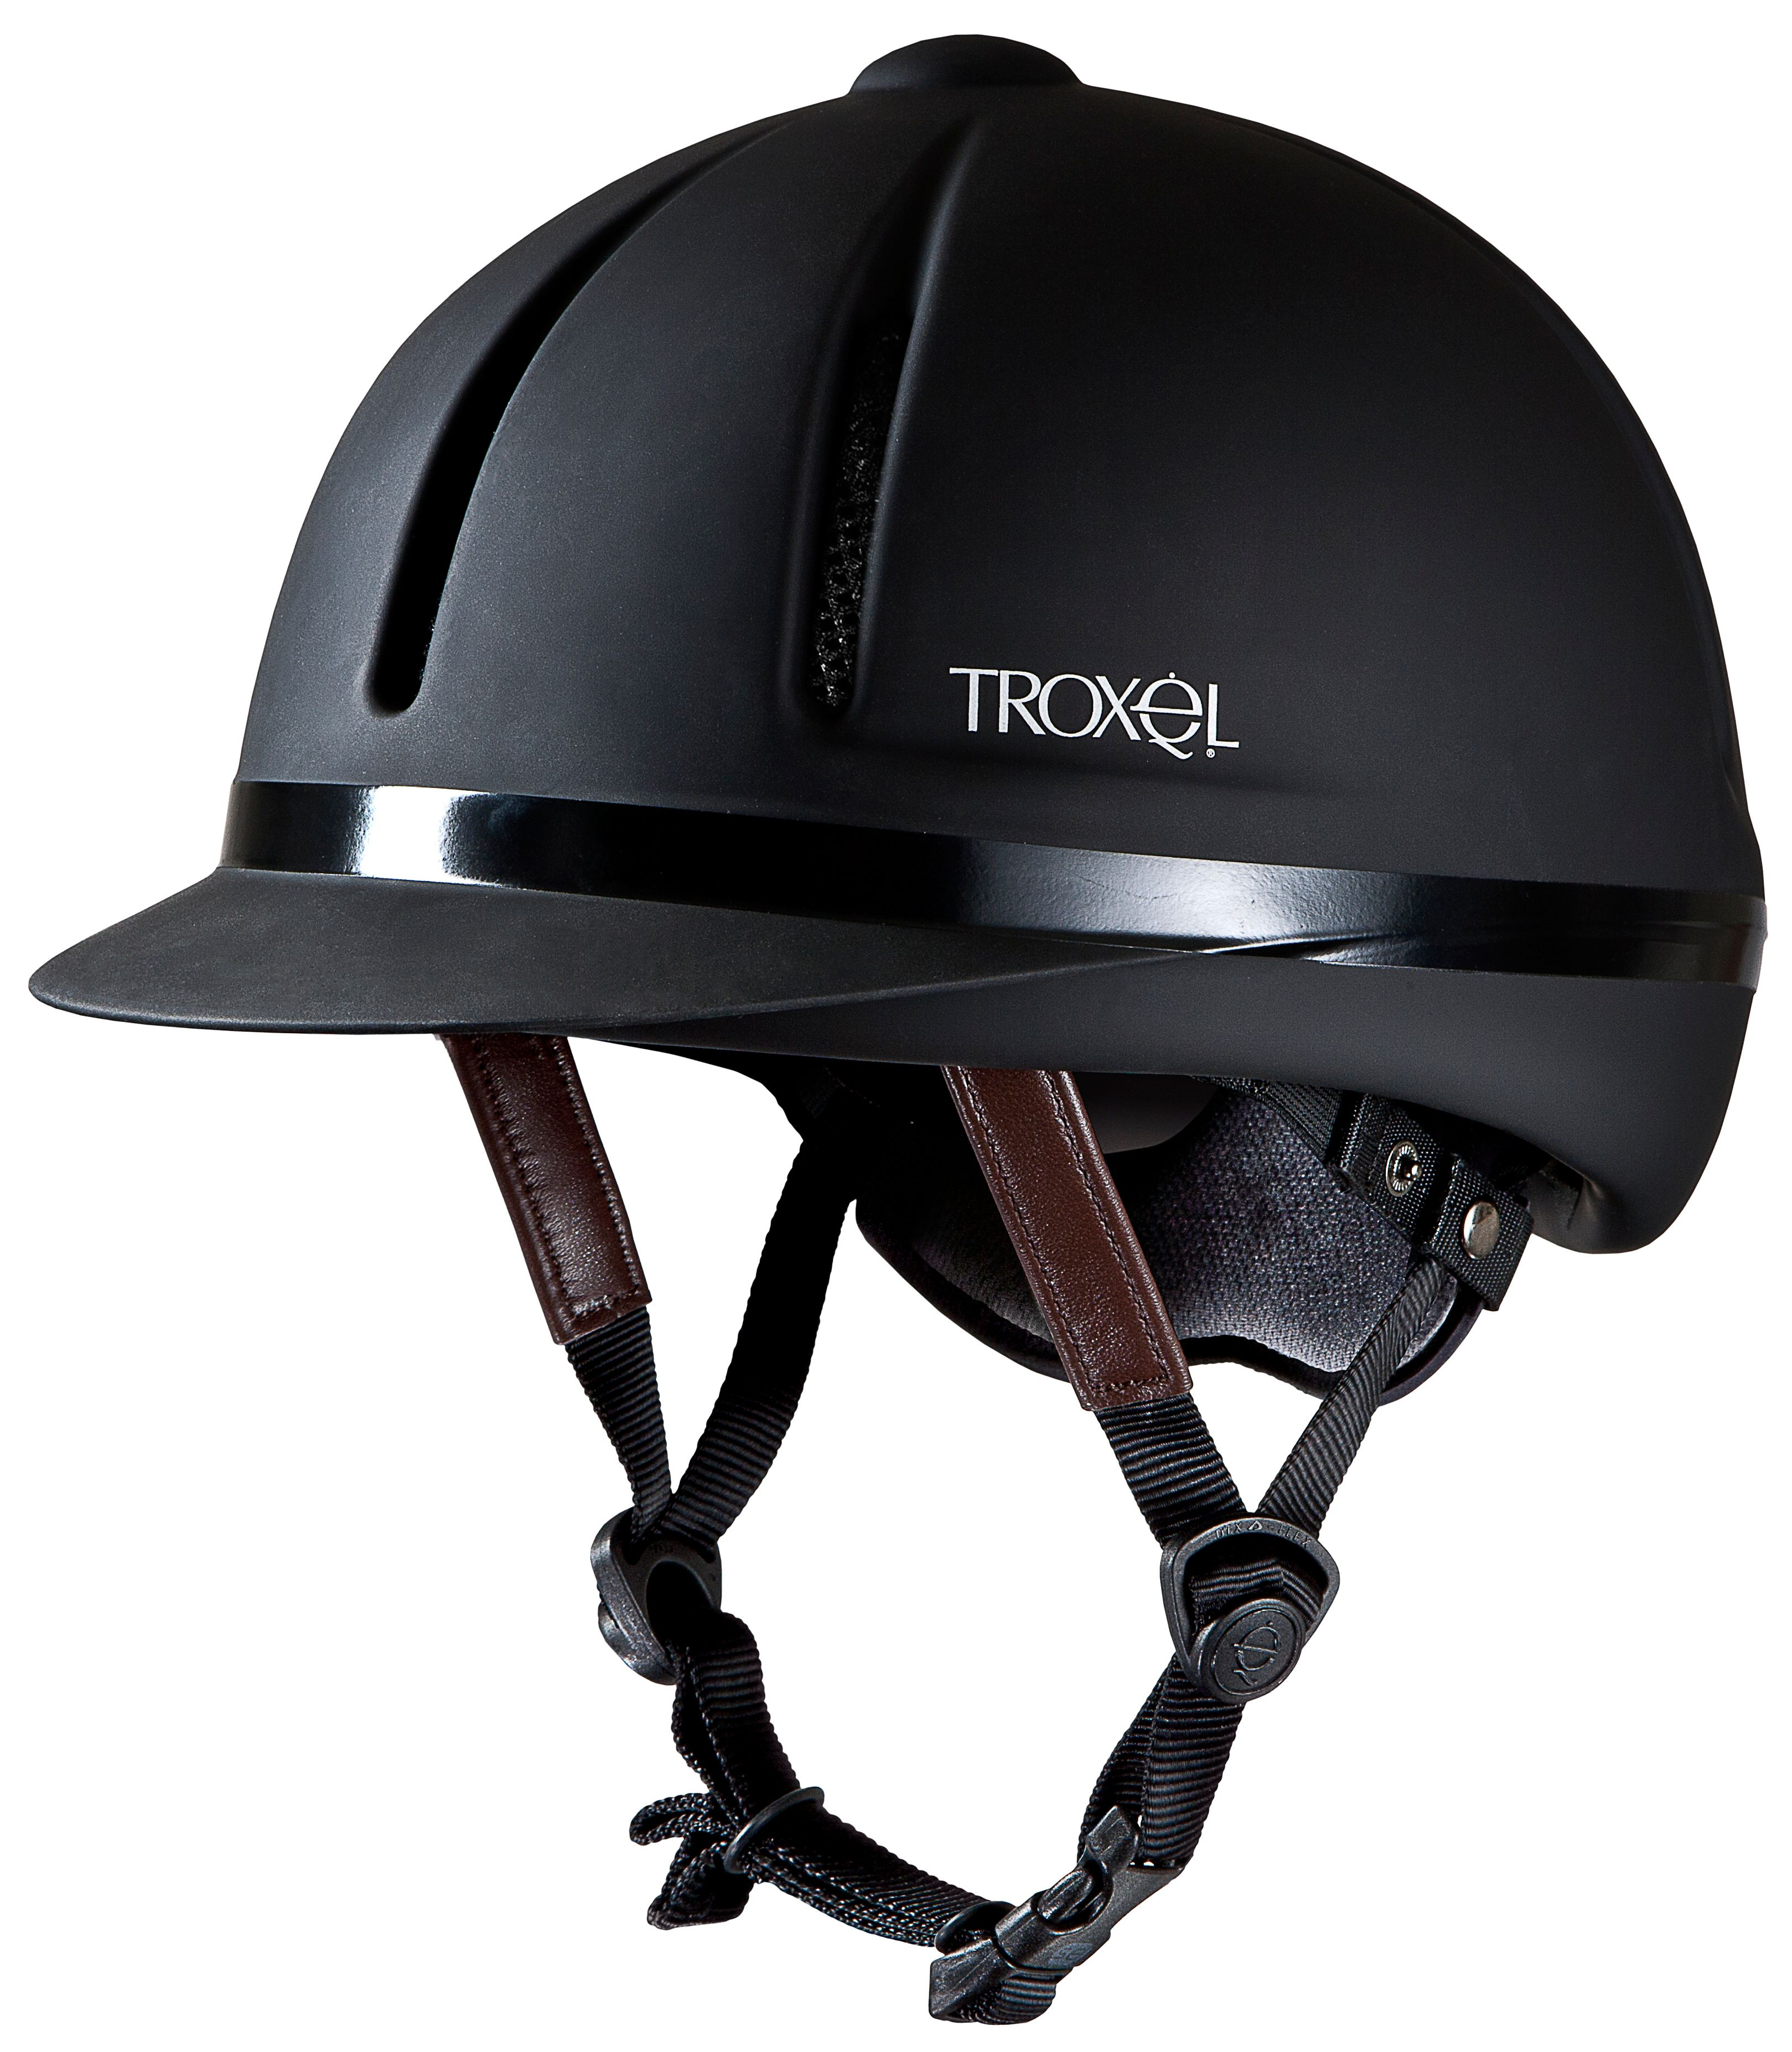 Troxel Legacy Gold CinchFit Helmet